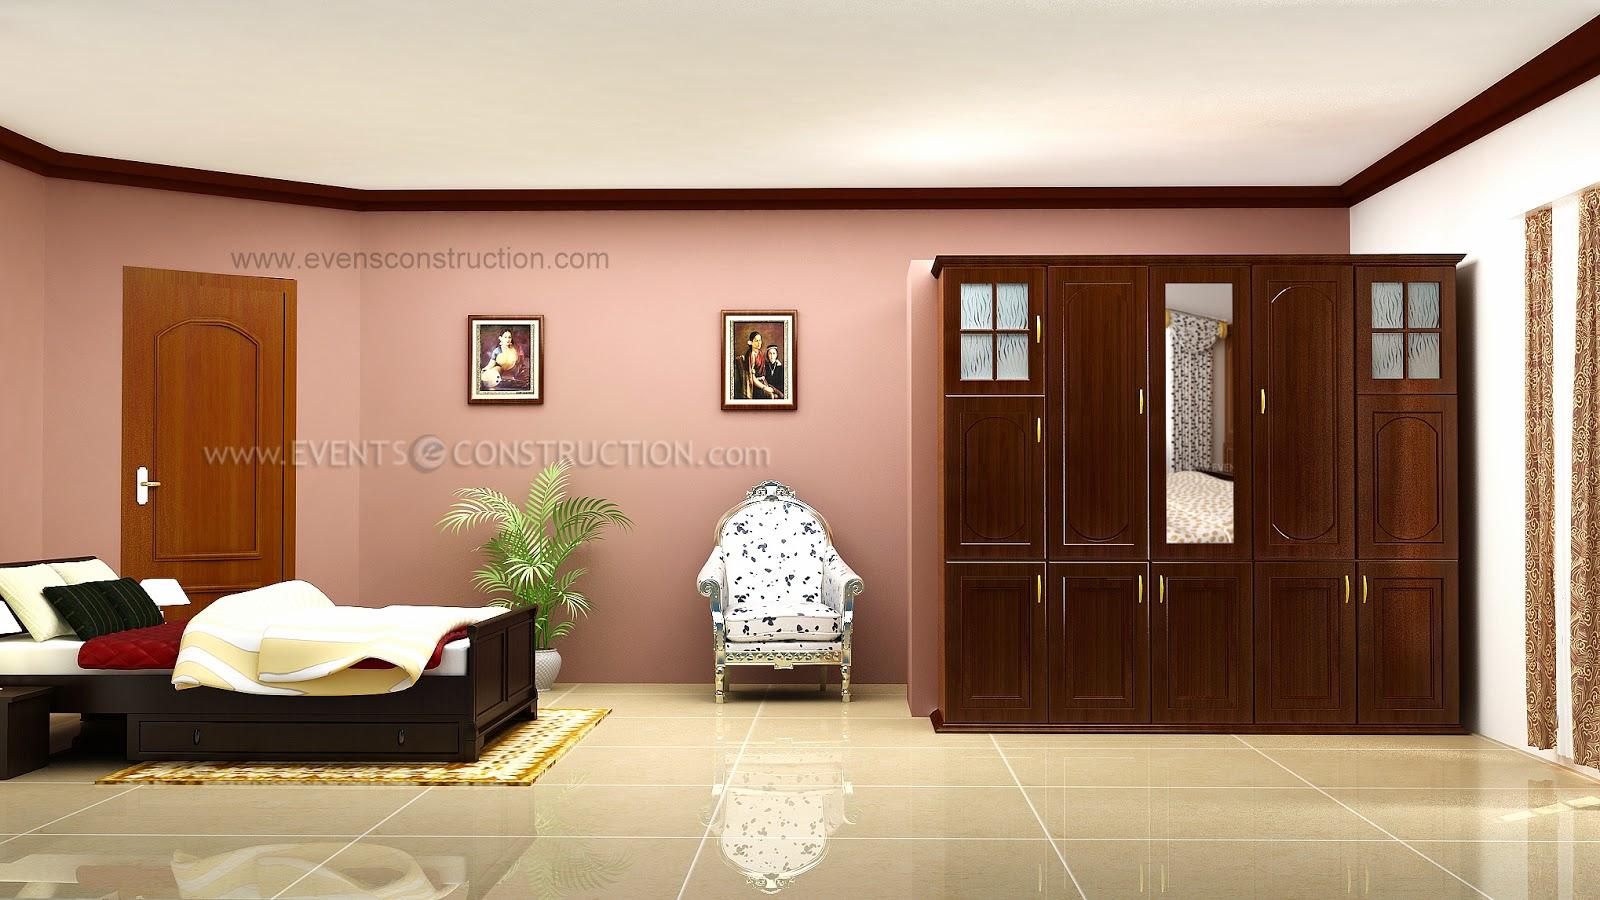 evens construction pvt ltd spacious bedroom interior